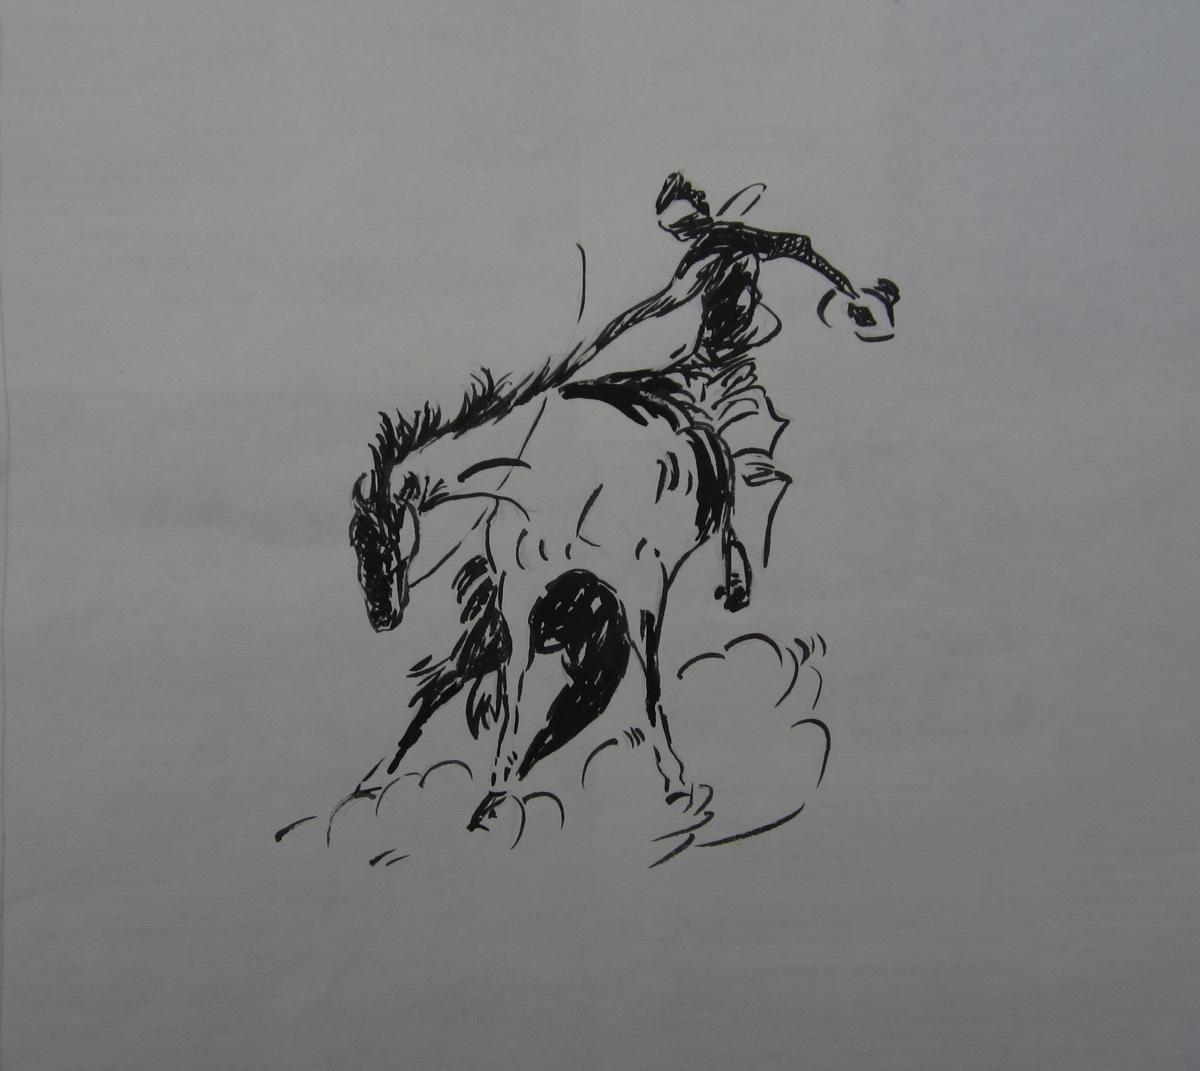 Cowboy (large view)